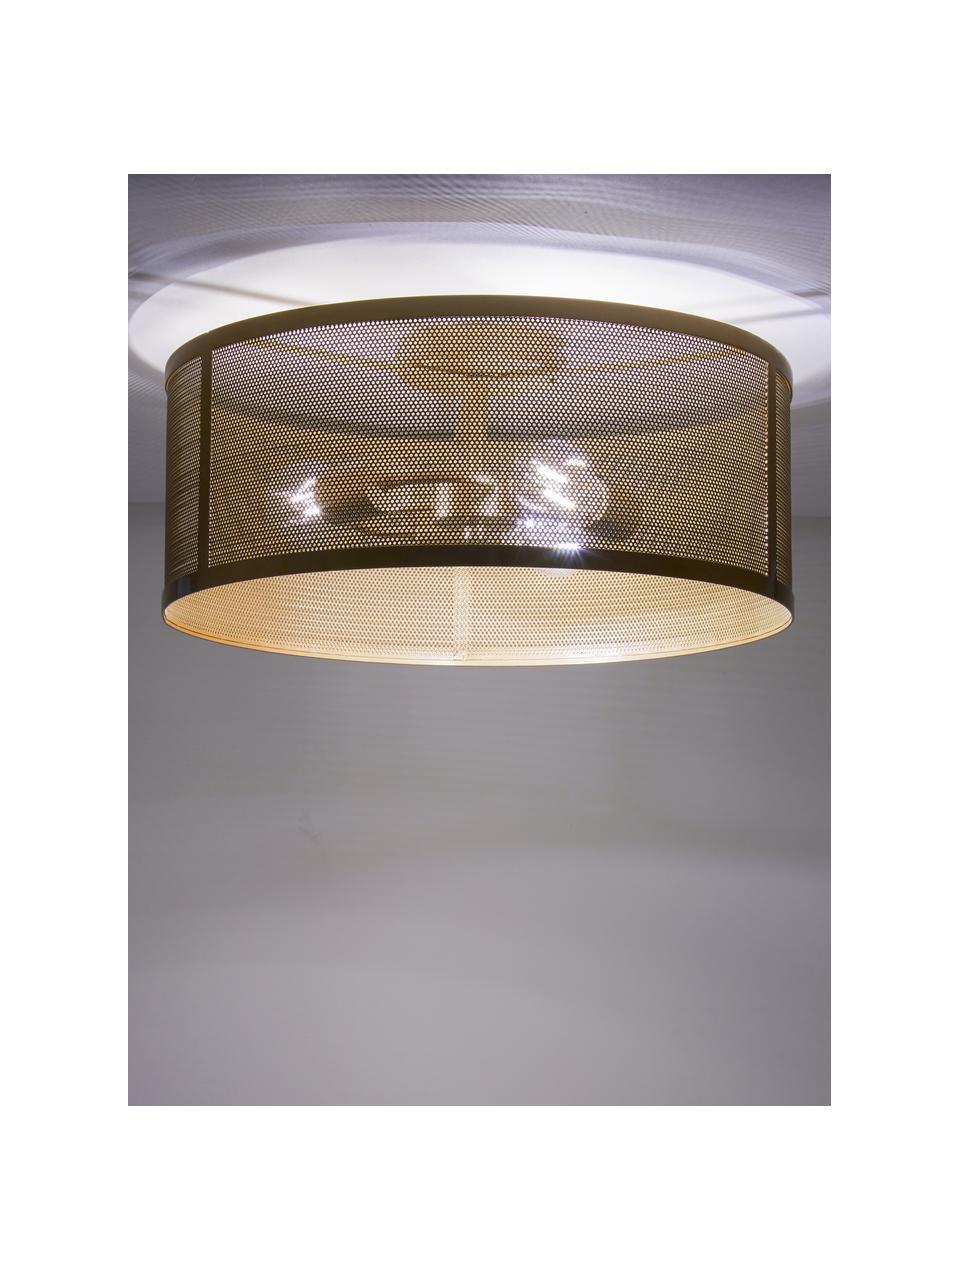 Plafoniera dorata Fishnet, Paralume: metallo rivestito, Baldacchino: metallo rivestito, Dorato, Ø 45 x Alt. 21 cm